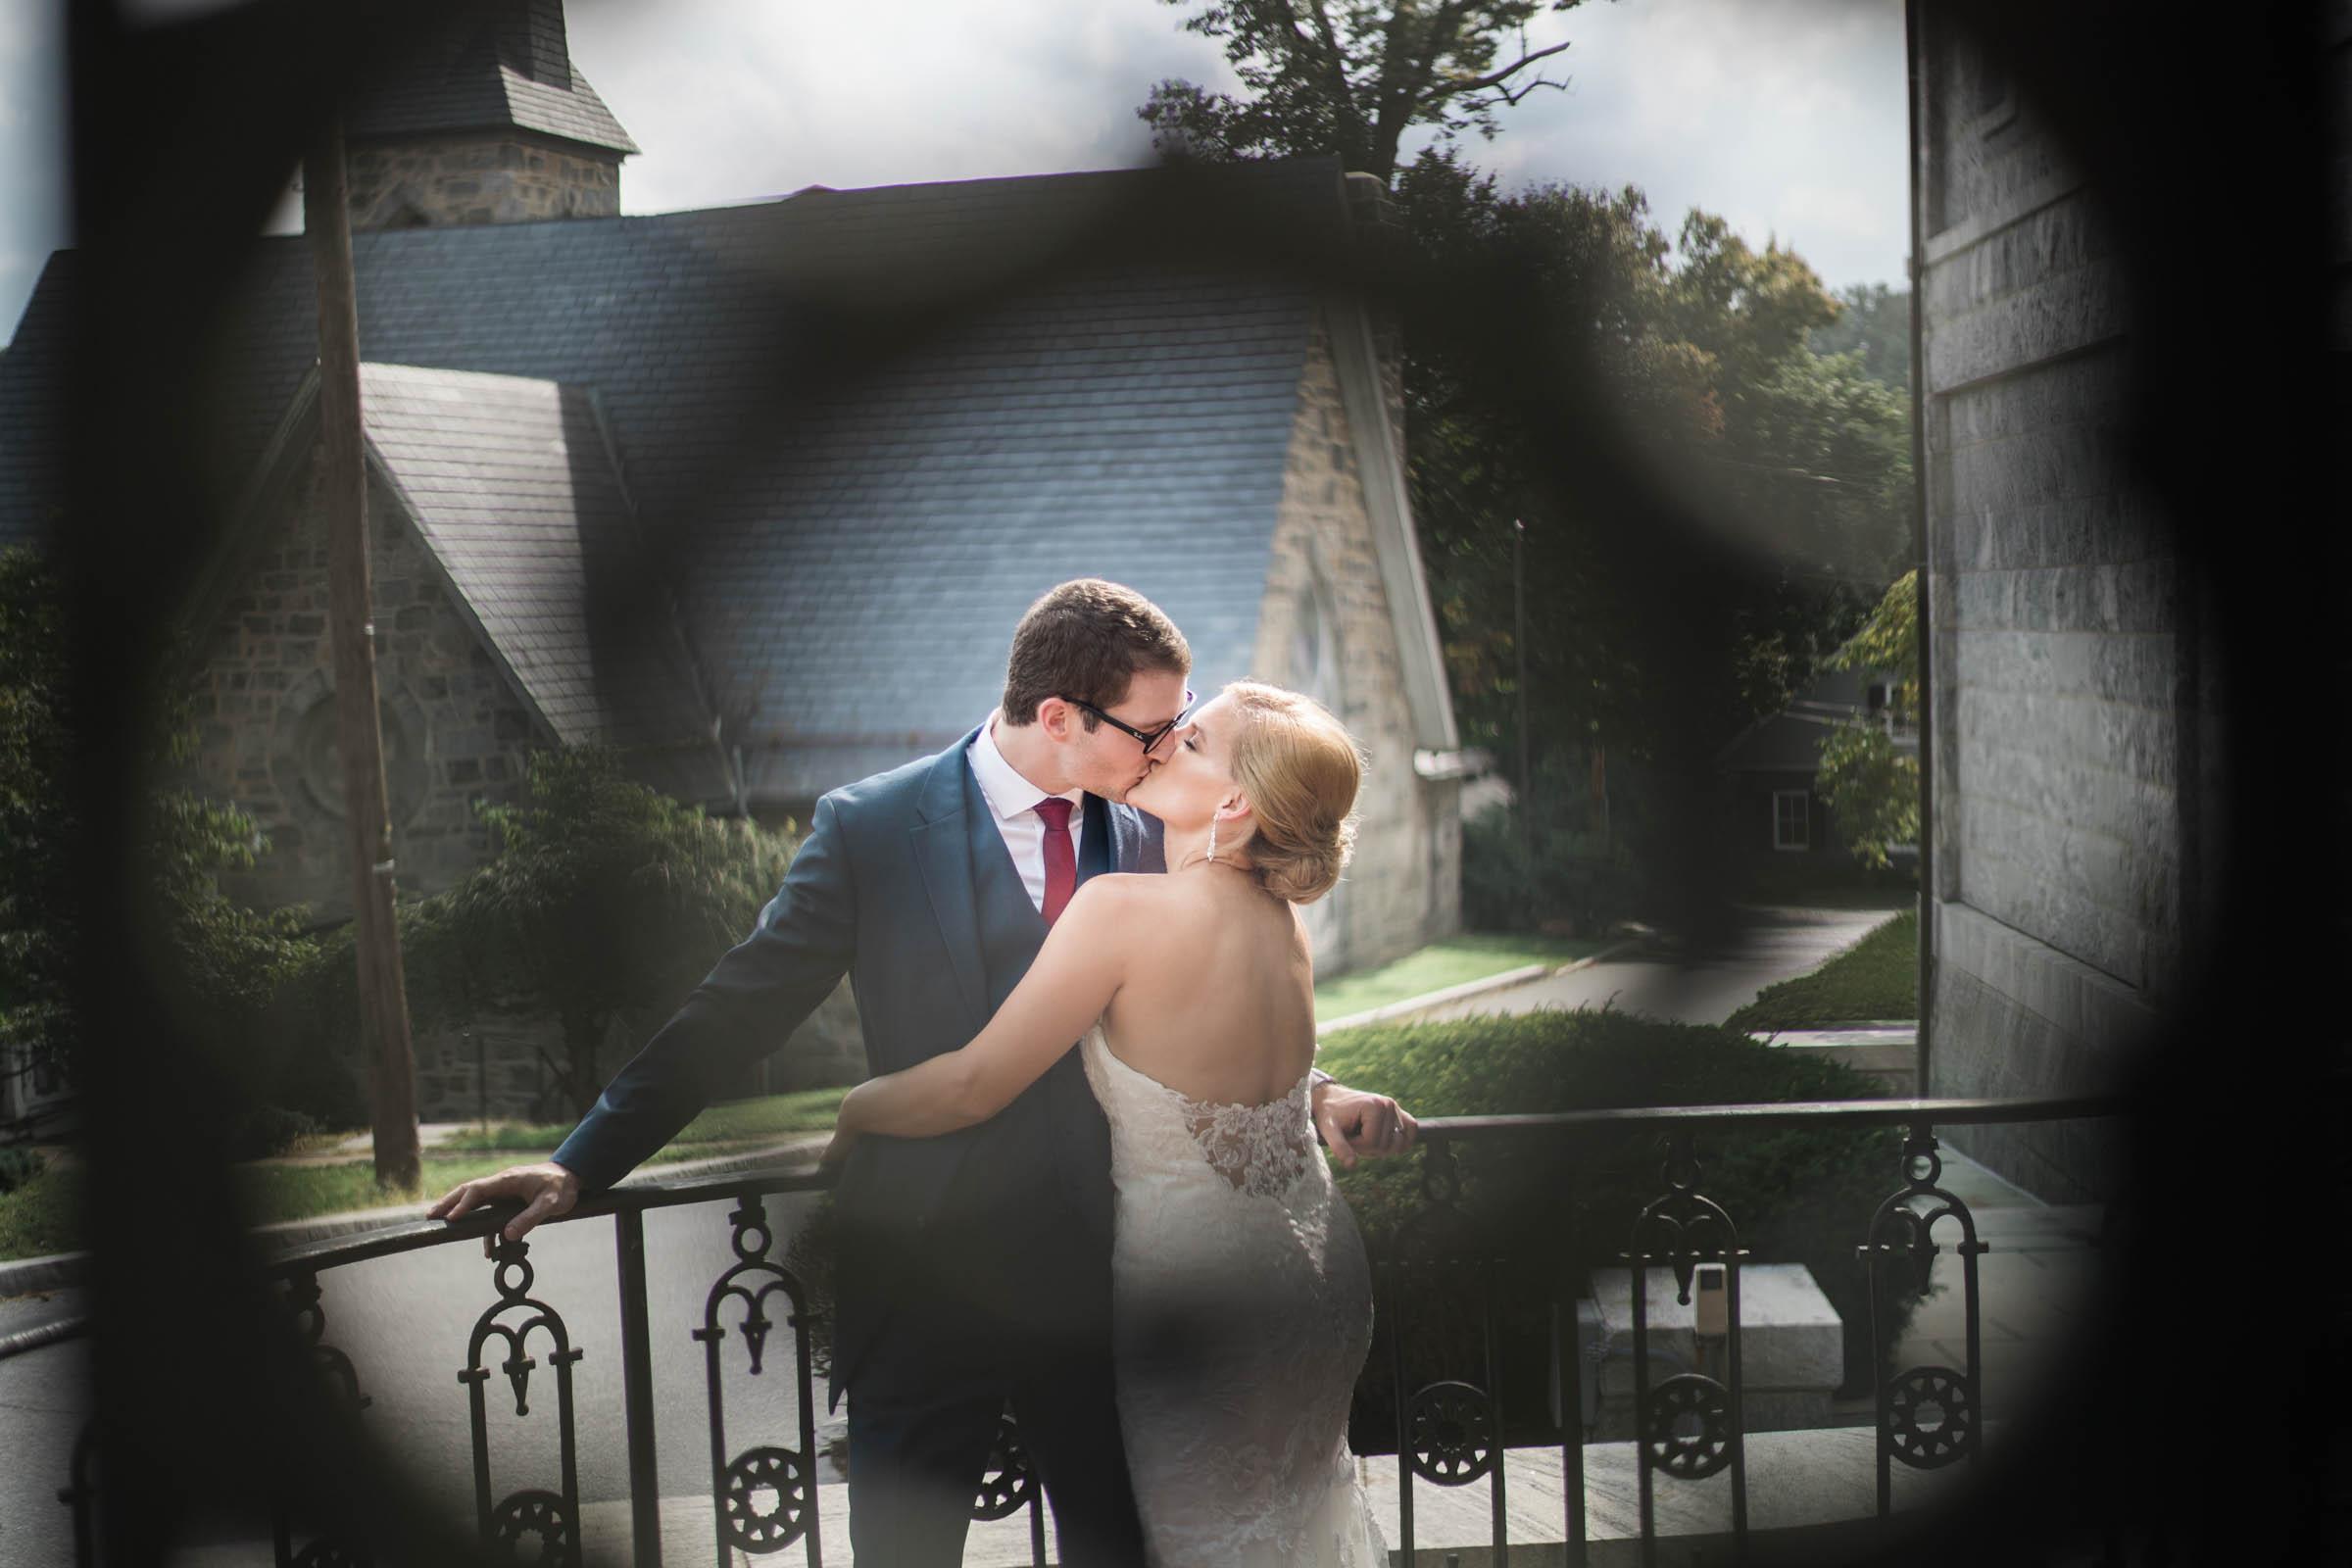 Ellicott City Wedding Photography by Megapixels Media Top Maryland Wedding Photographer new orleans style wedding.jpg